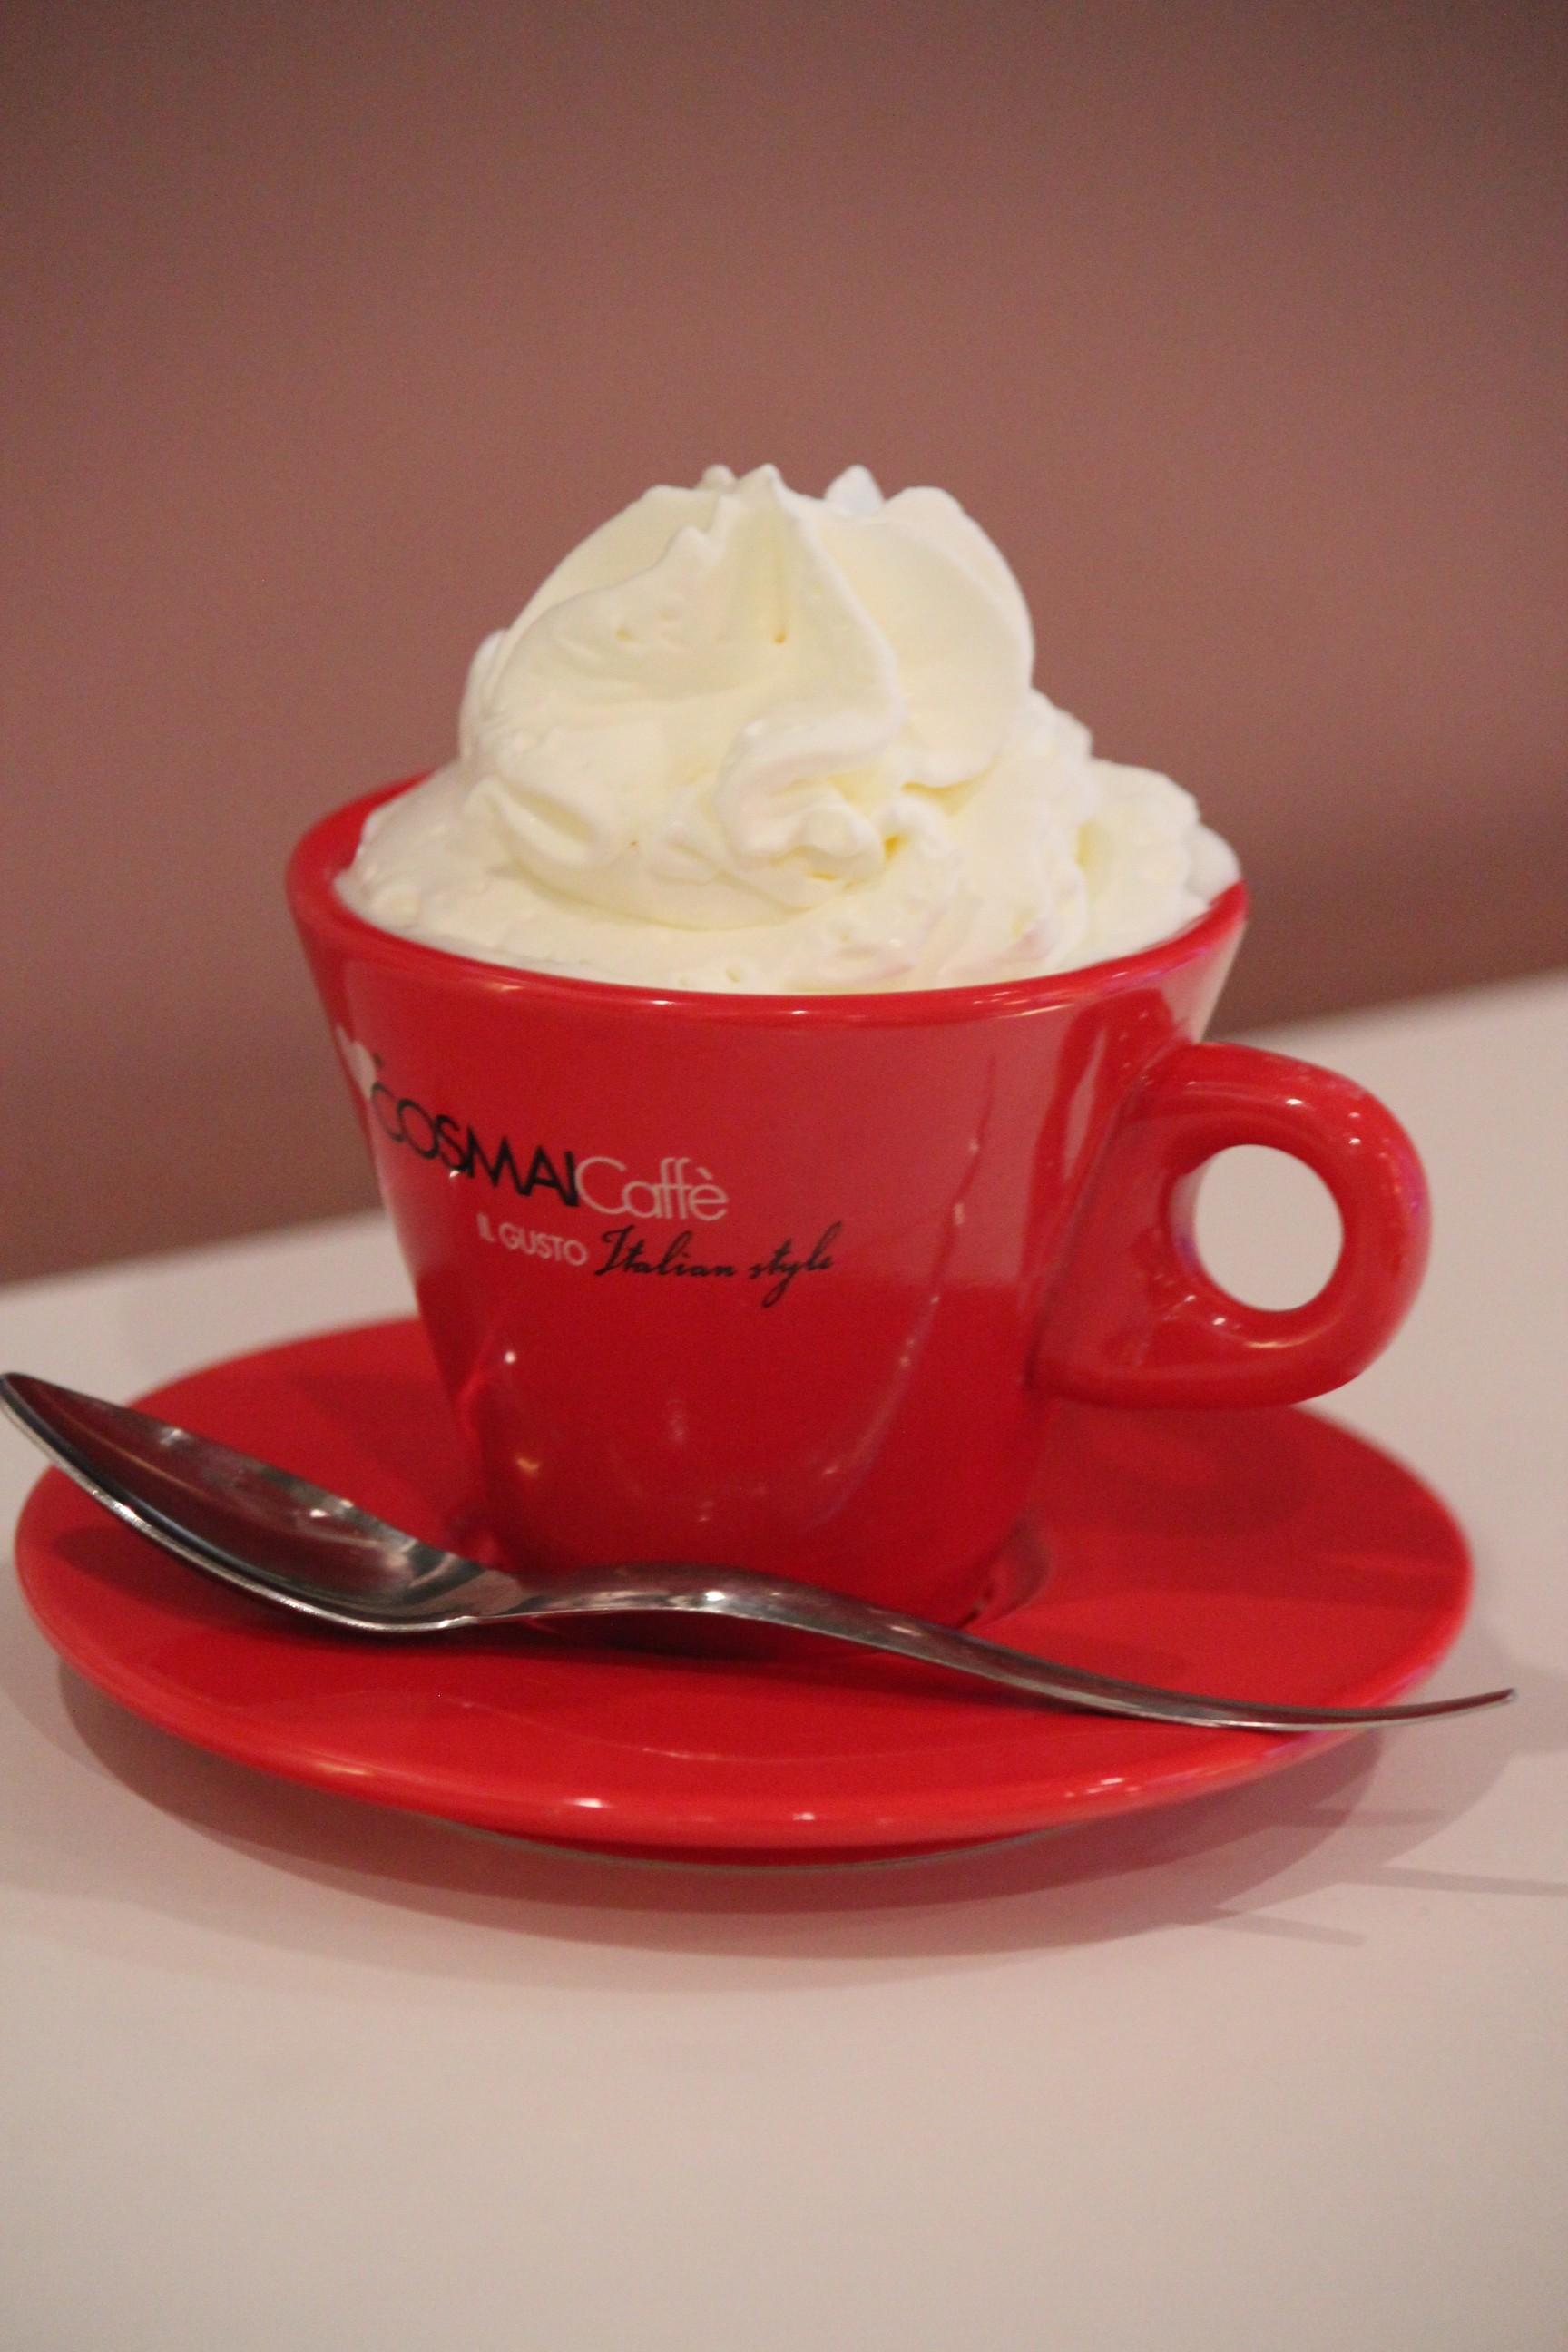 Hot Chocolate; Milan, Italy; 2011